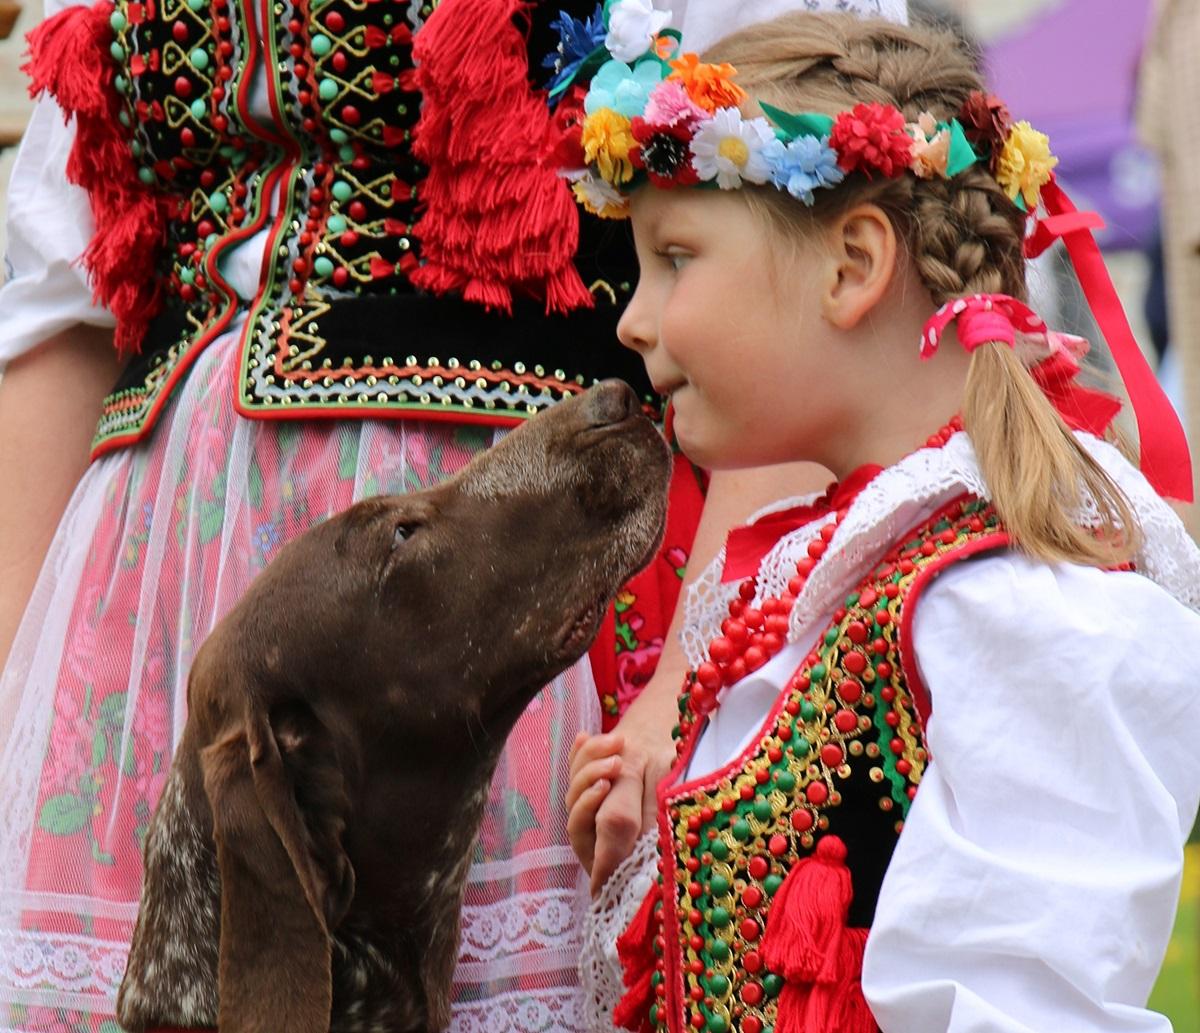 Fot. Beata Dziwulska